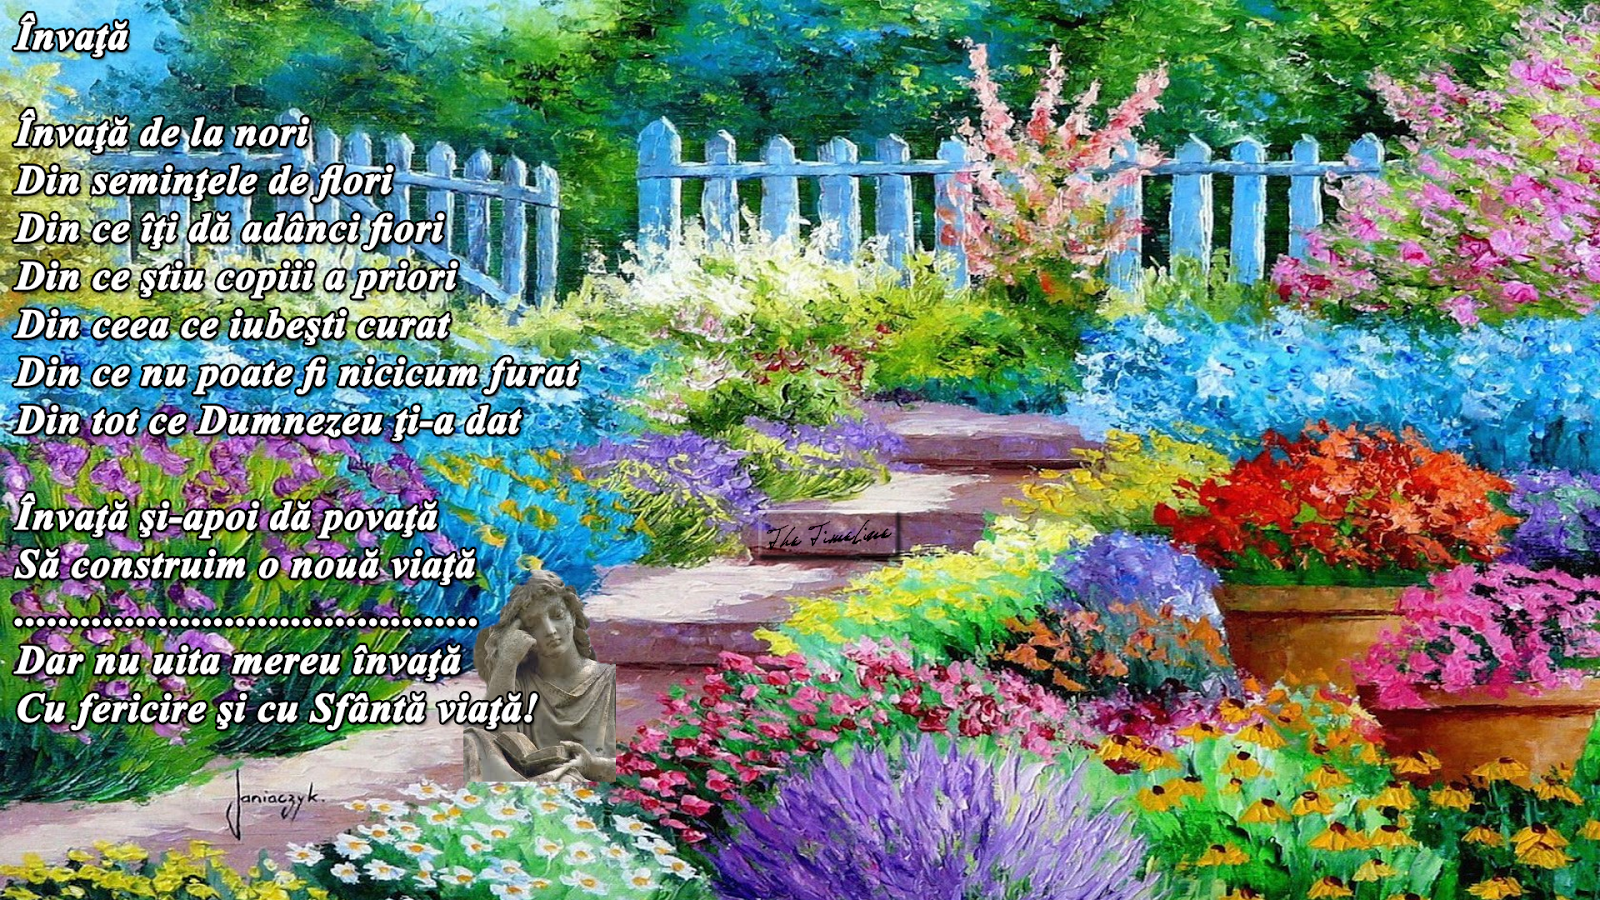 invata devenire credinta intelepciune Dumnezeu iubire Iisus natura Maria Teodorescu Bahnareanu Wrinkles on my Timeline